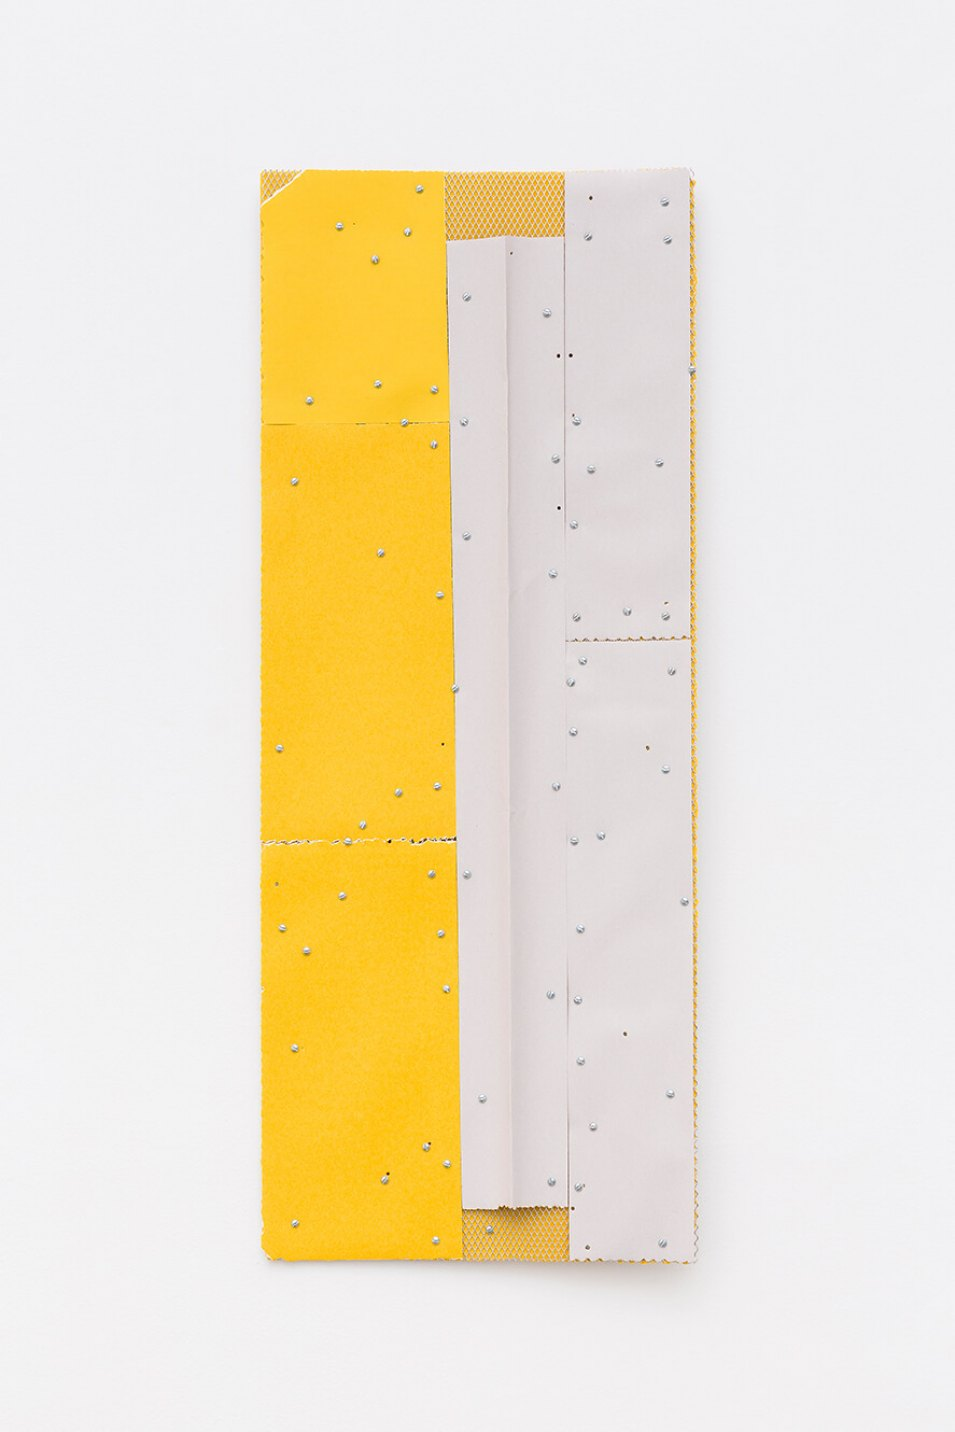 Alessandro Carano,White Line,2017,collage: sandpaper, grid of aluminum and screw, 100 × 40 cm - Mendes Wood DM